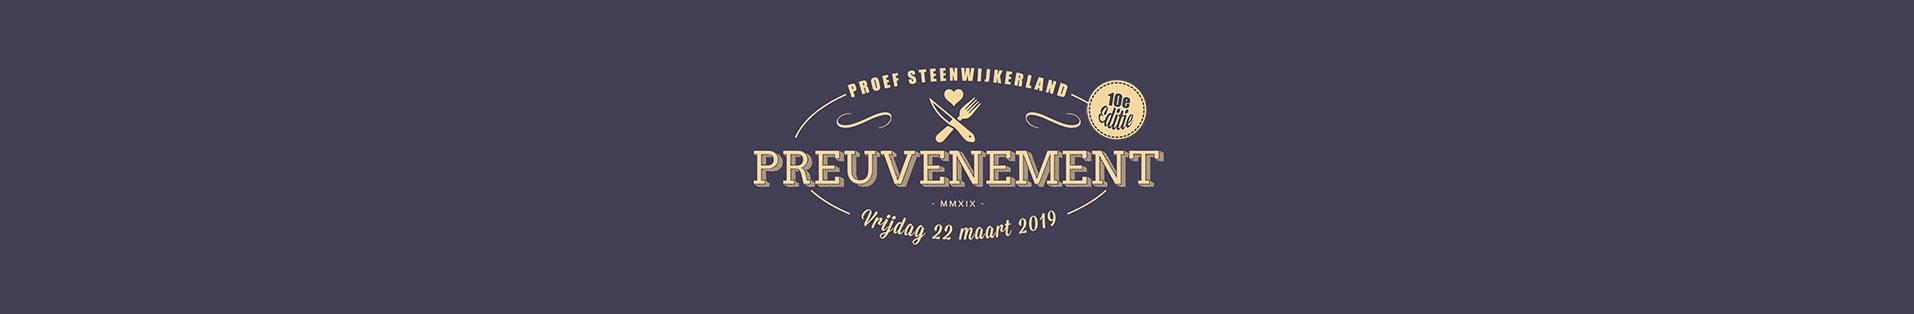 Proef Steenwijkerland 10e editie logo